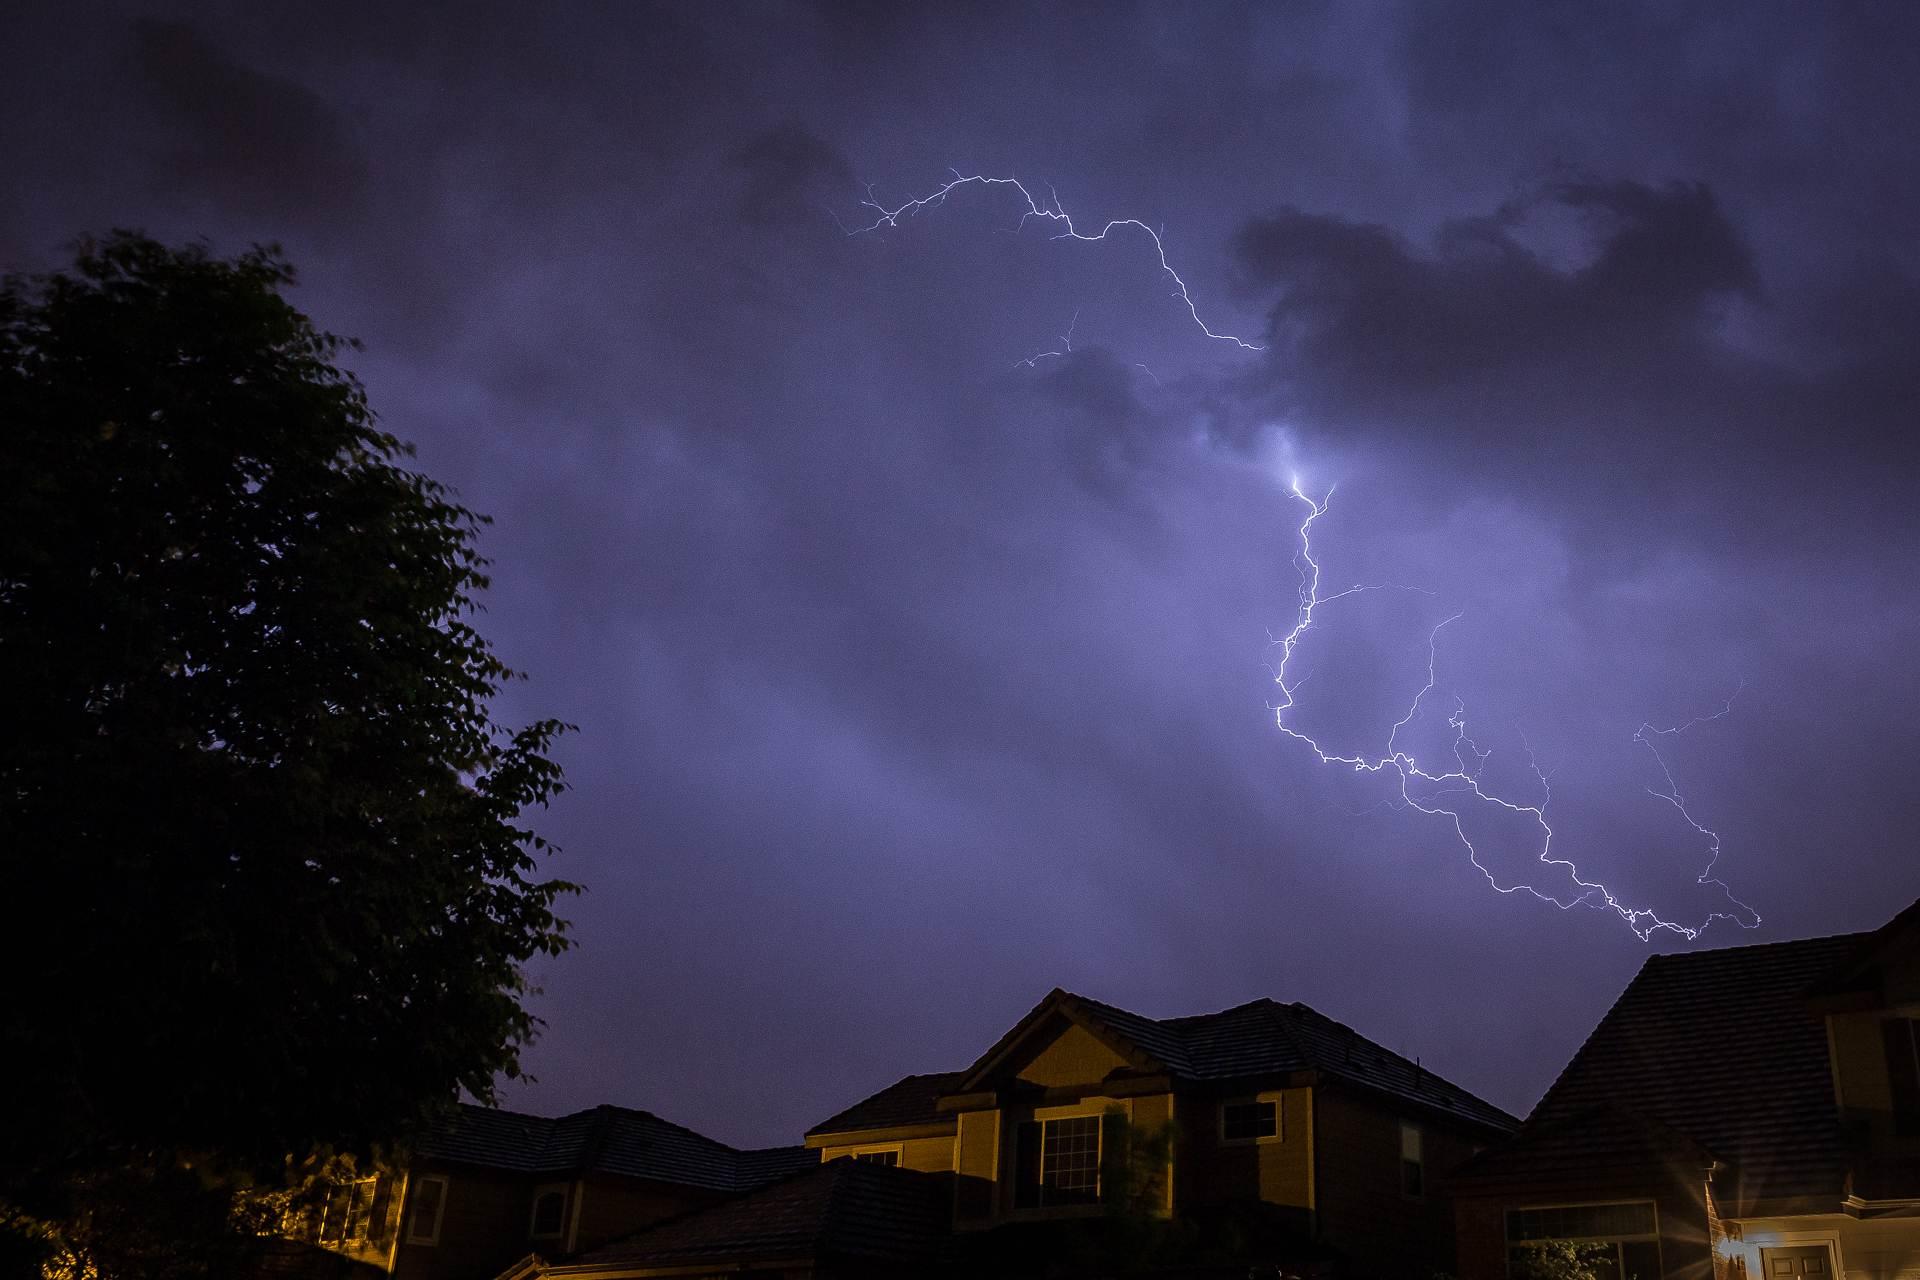 Neighborhood Lightning 2 -  by D Scott Smith